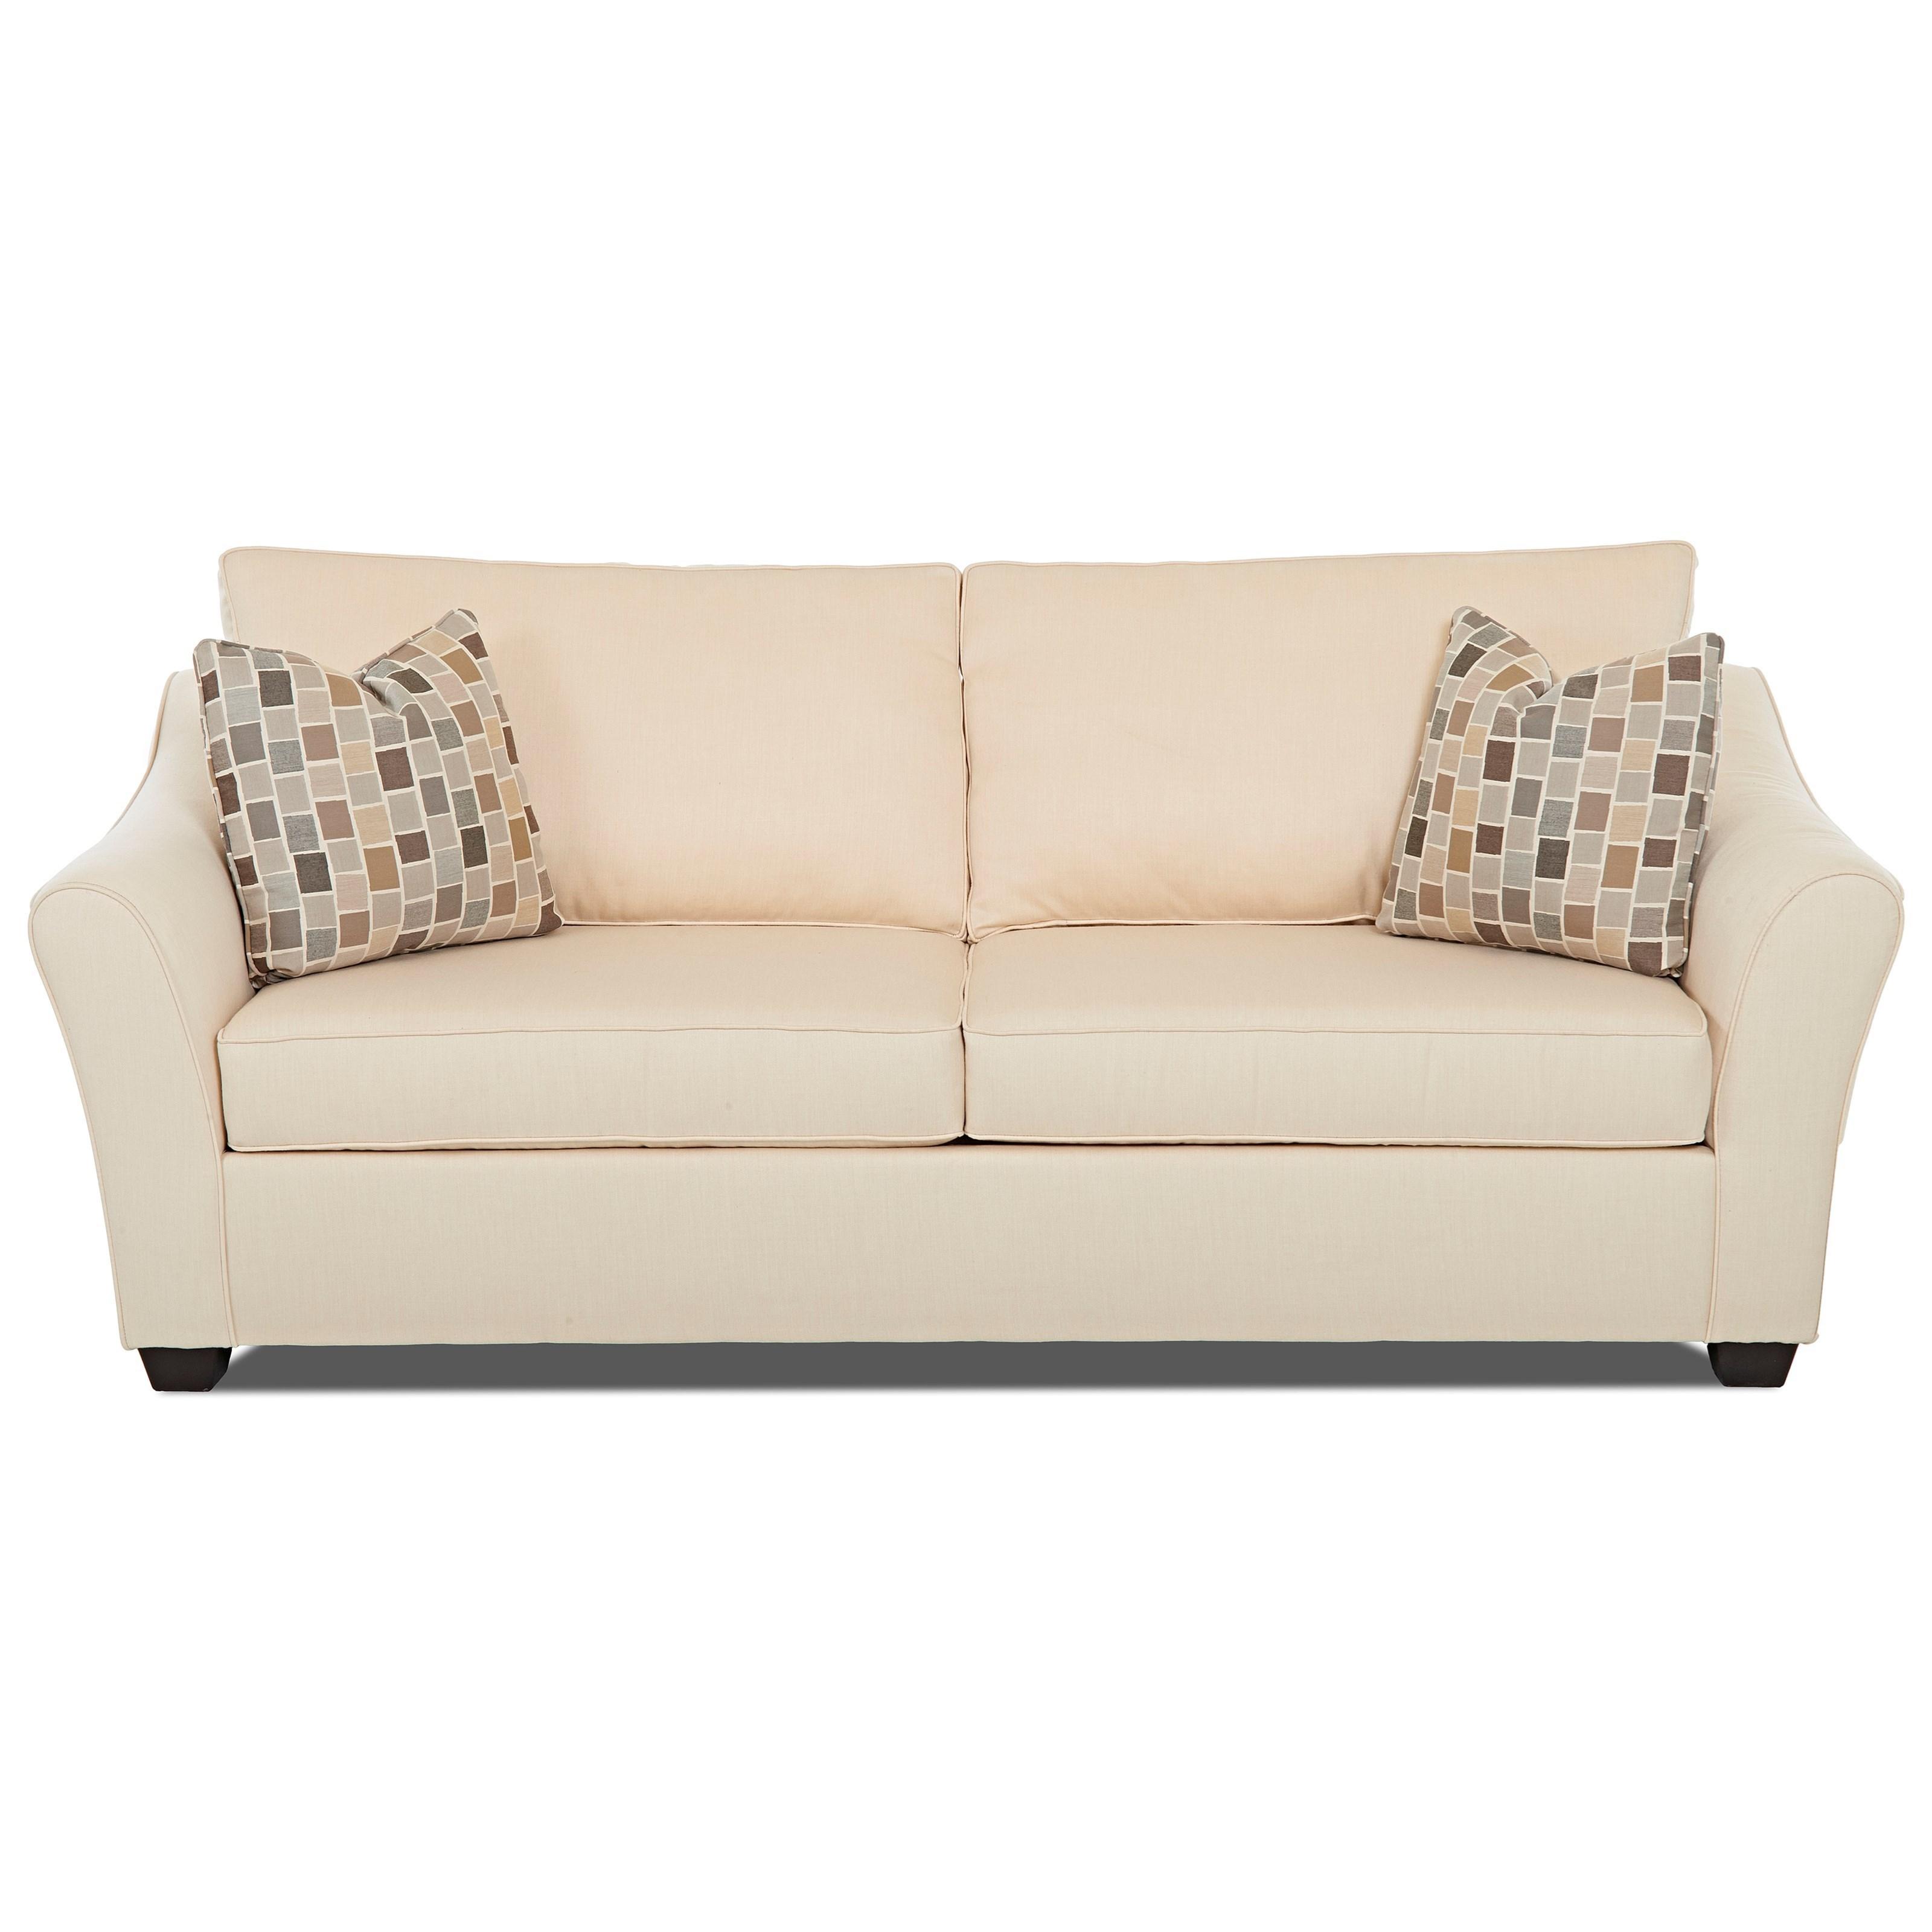 Klaussner Linville Sofa - Item Number: K80400 S-FLAGSHIP VELLUM